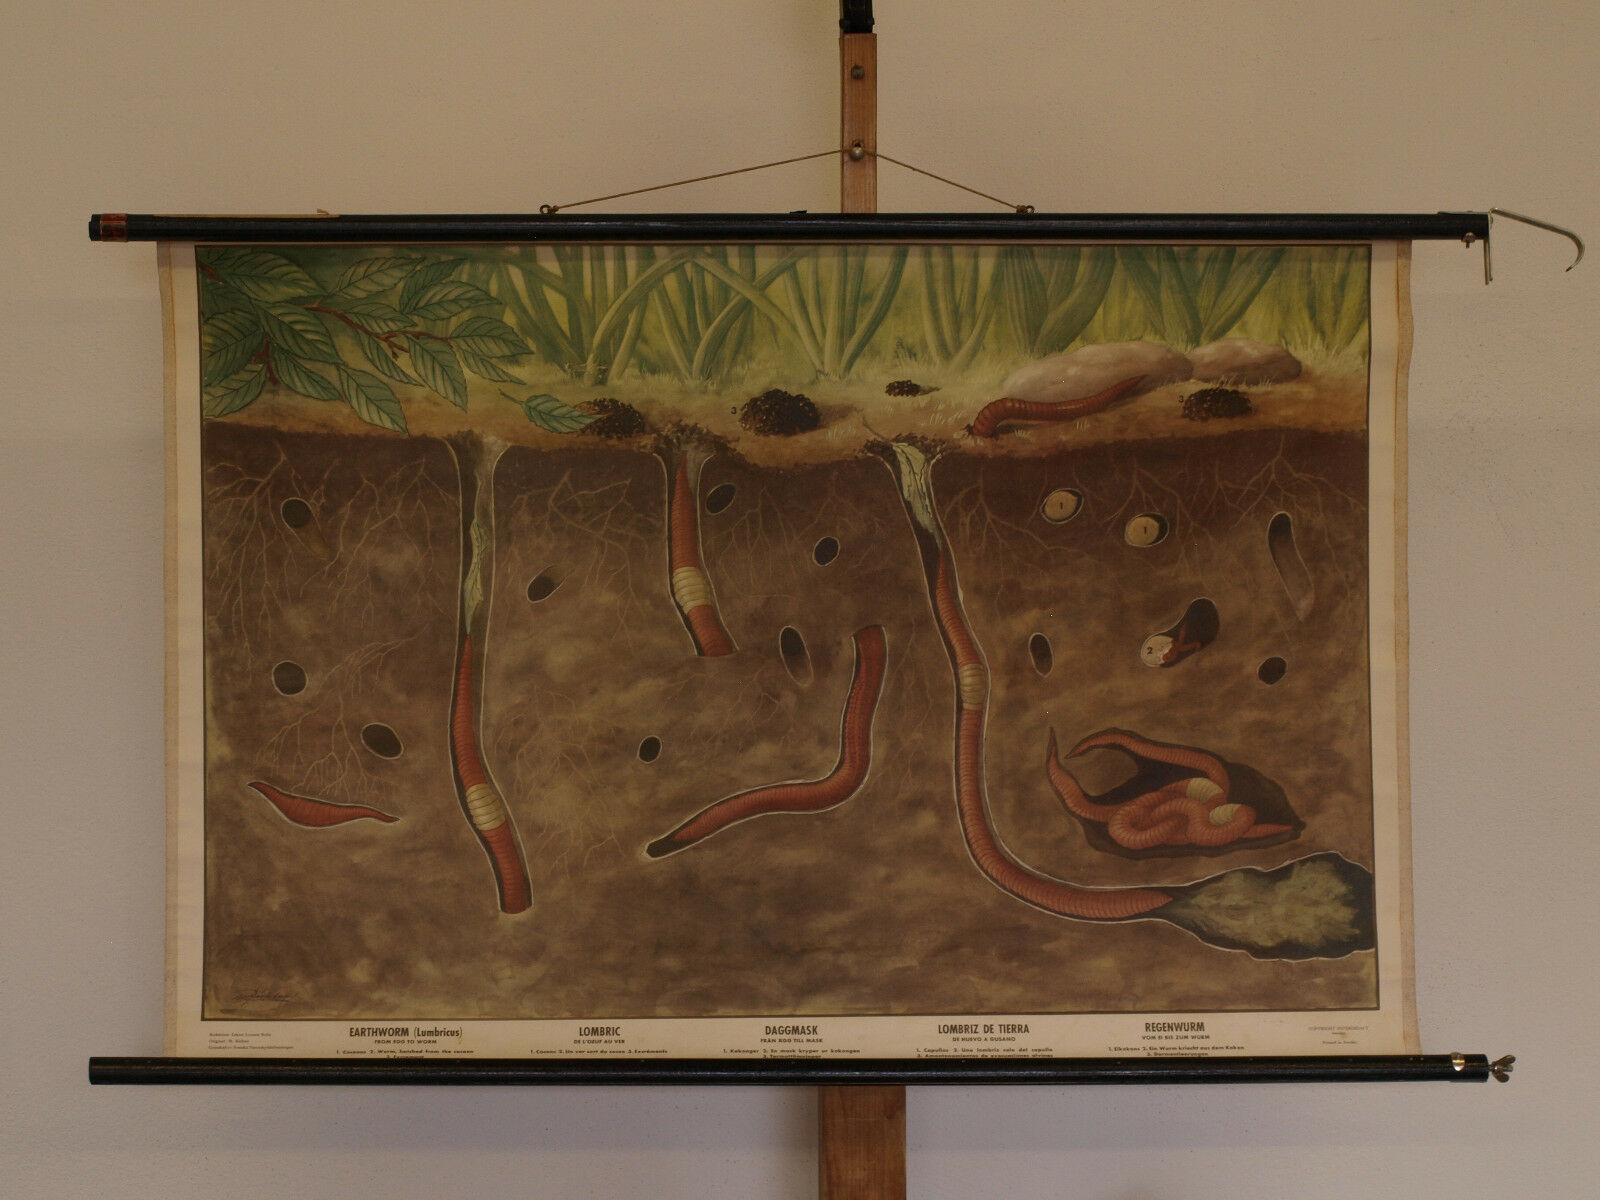 Quadro su Tela Lombrico Ringelwürmer 100x66cm 1954 Vintage School School School Earthworm 726b44